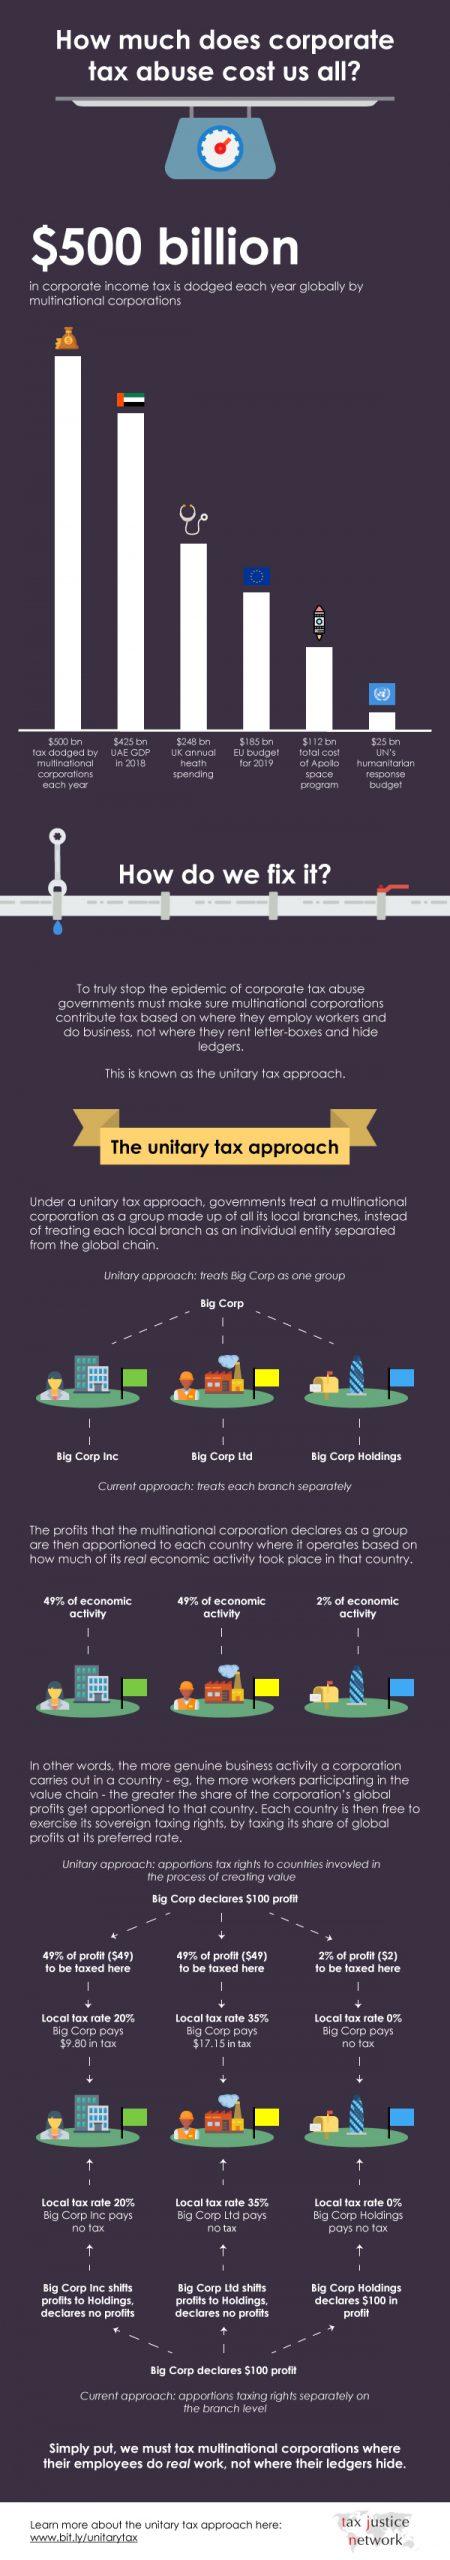 Unitary tax infographic